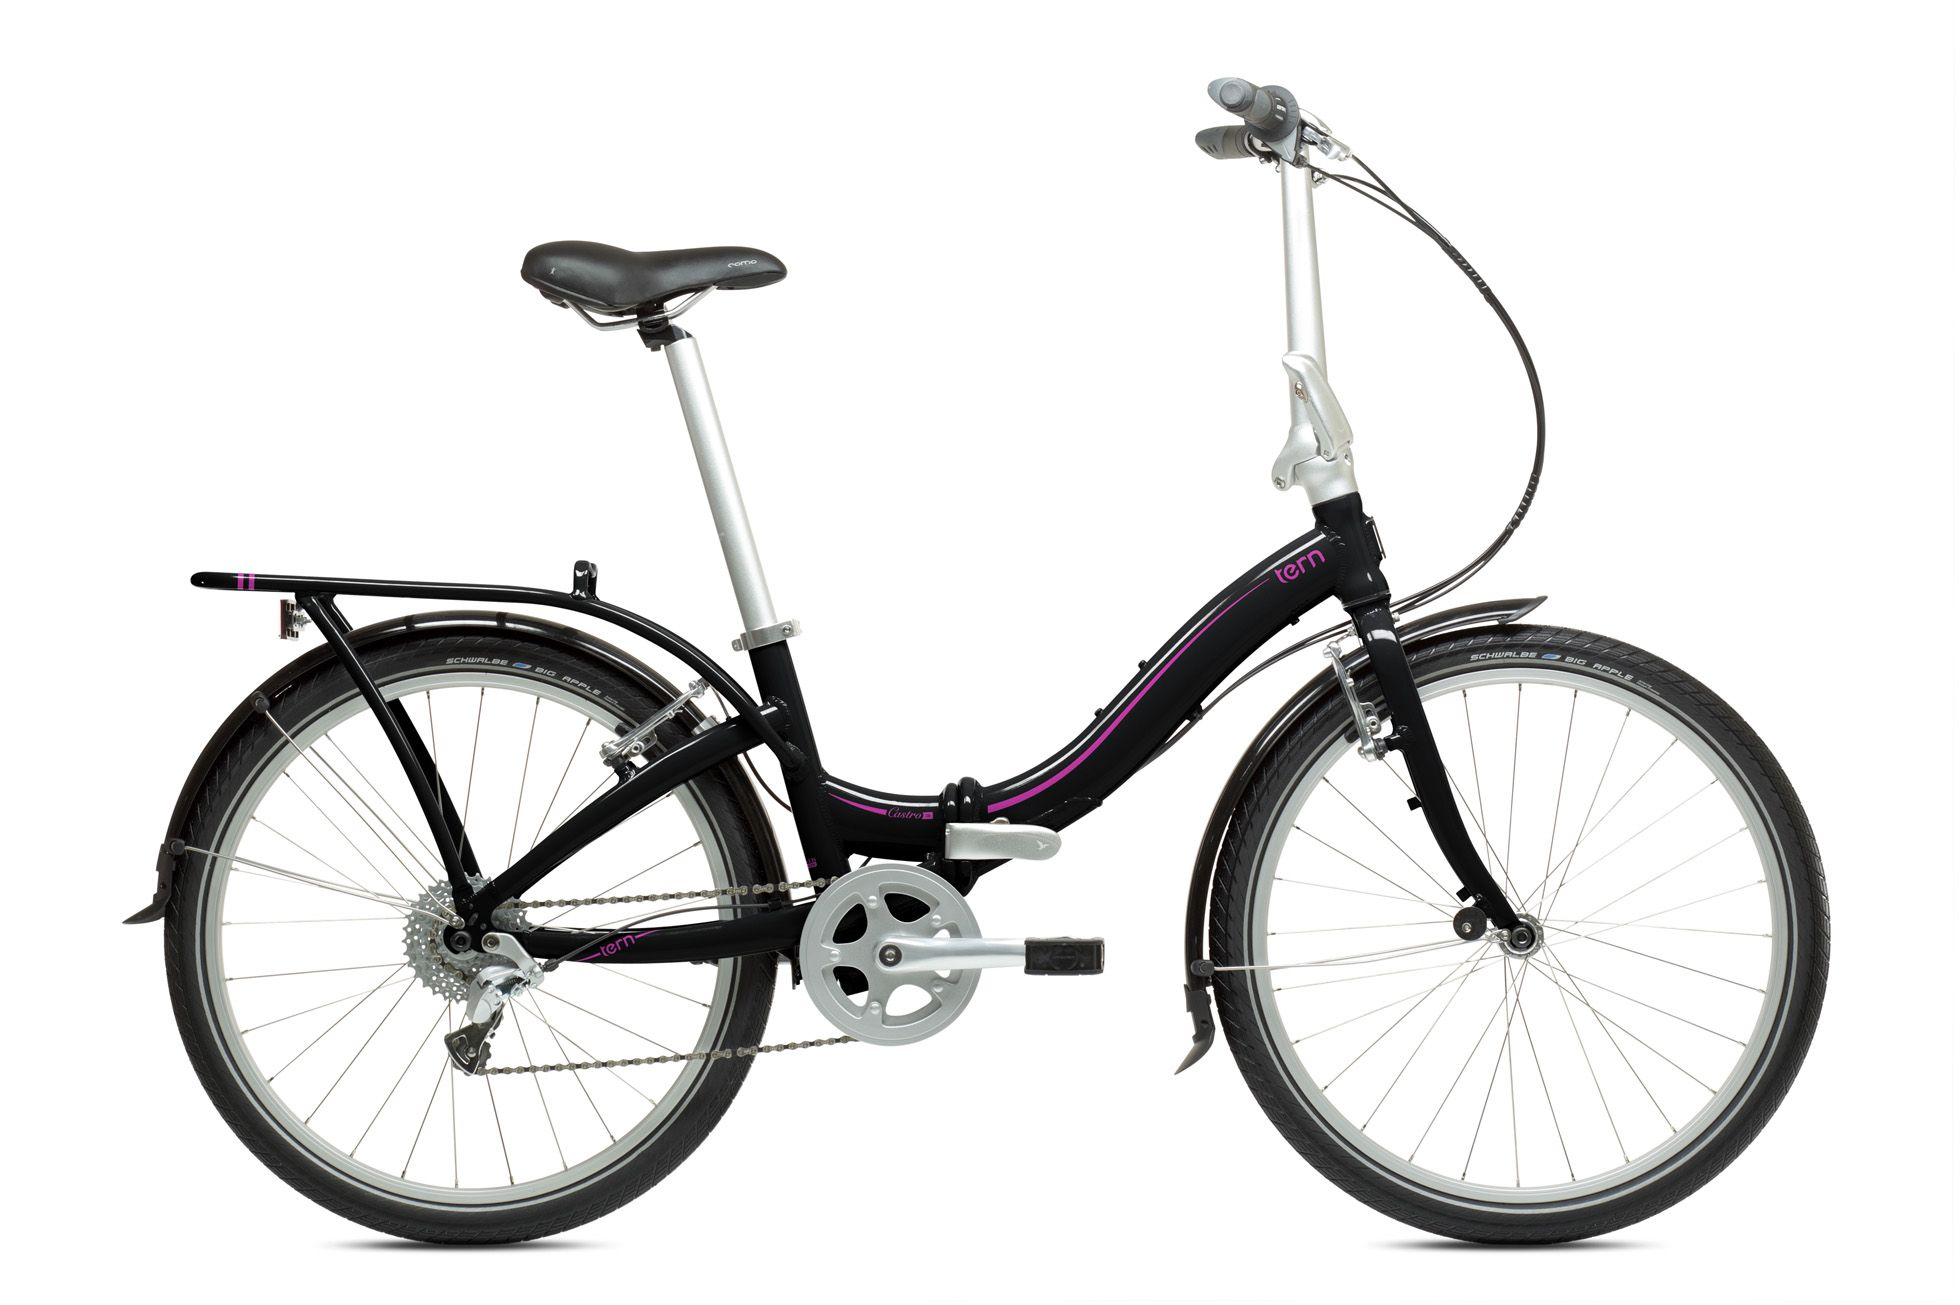 Skladaci Kolo Tern Castro D8 Bicykl Design